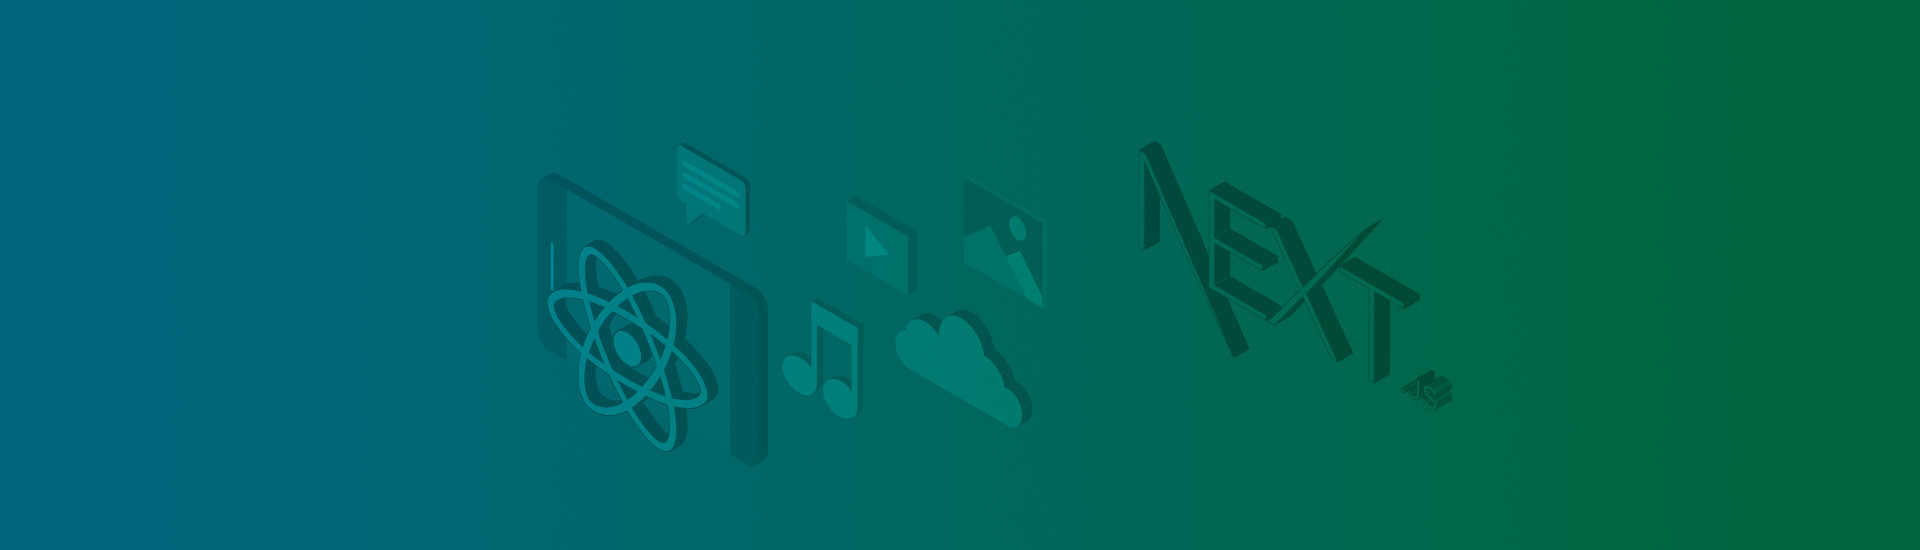 Service Worker issue - Next.js Framework